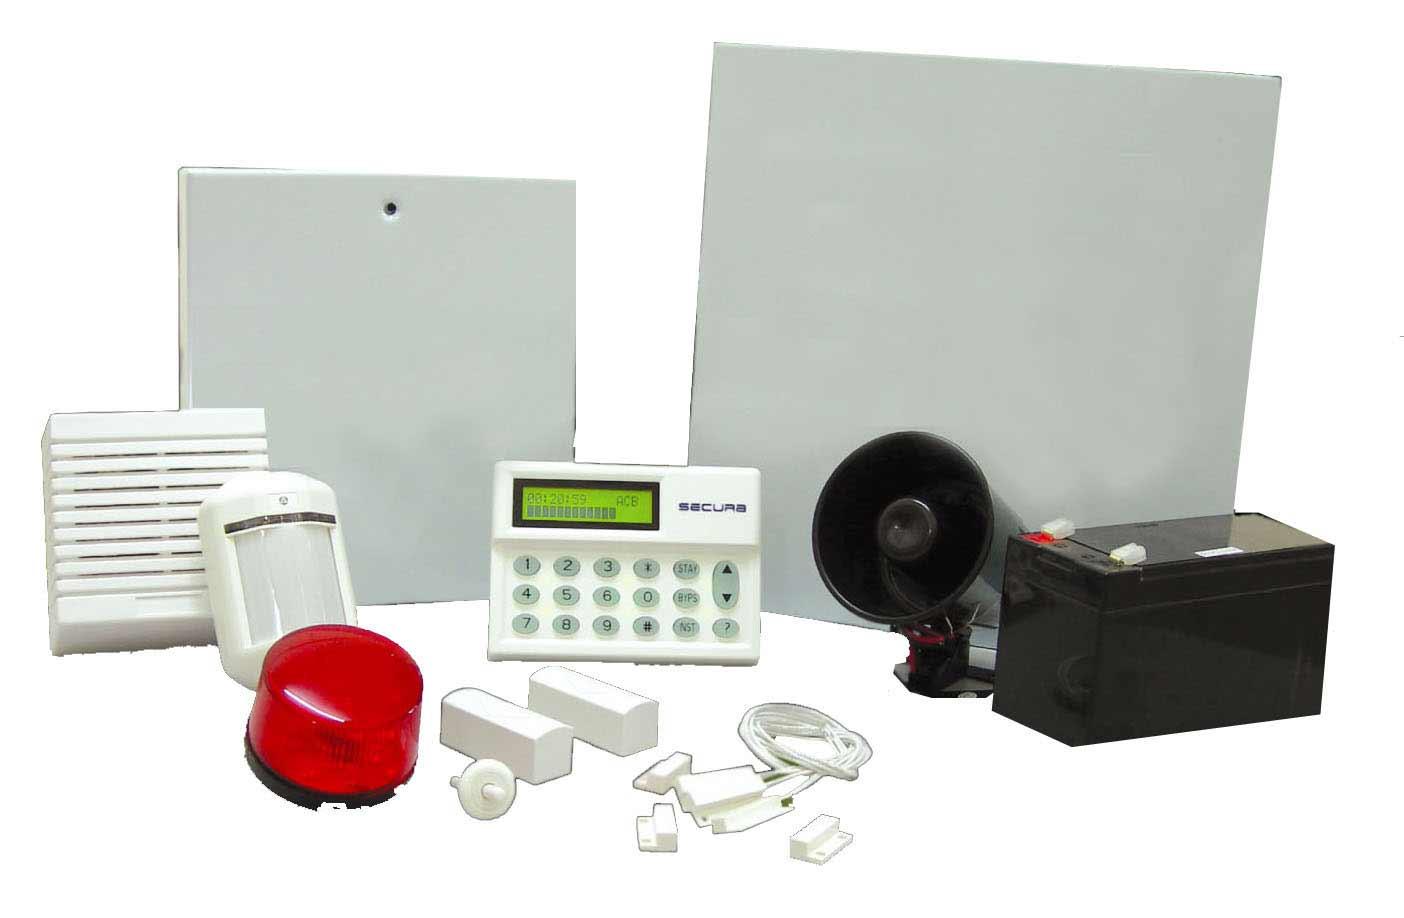 Secura Modern Home Alarm System Kits